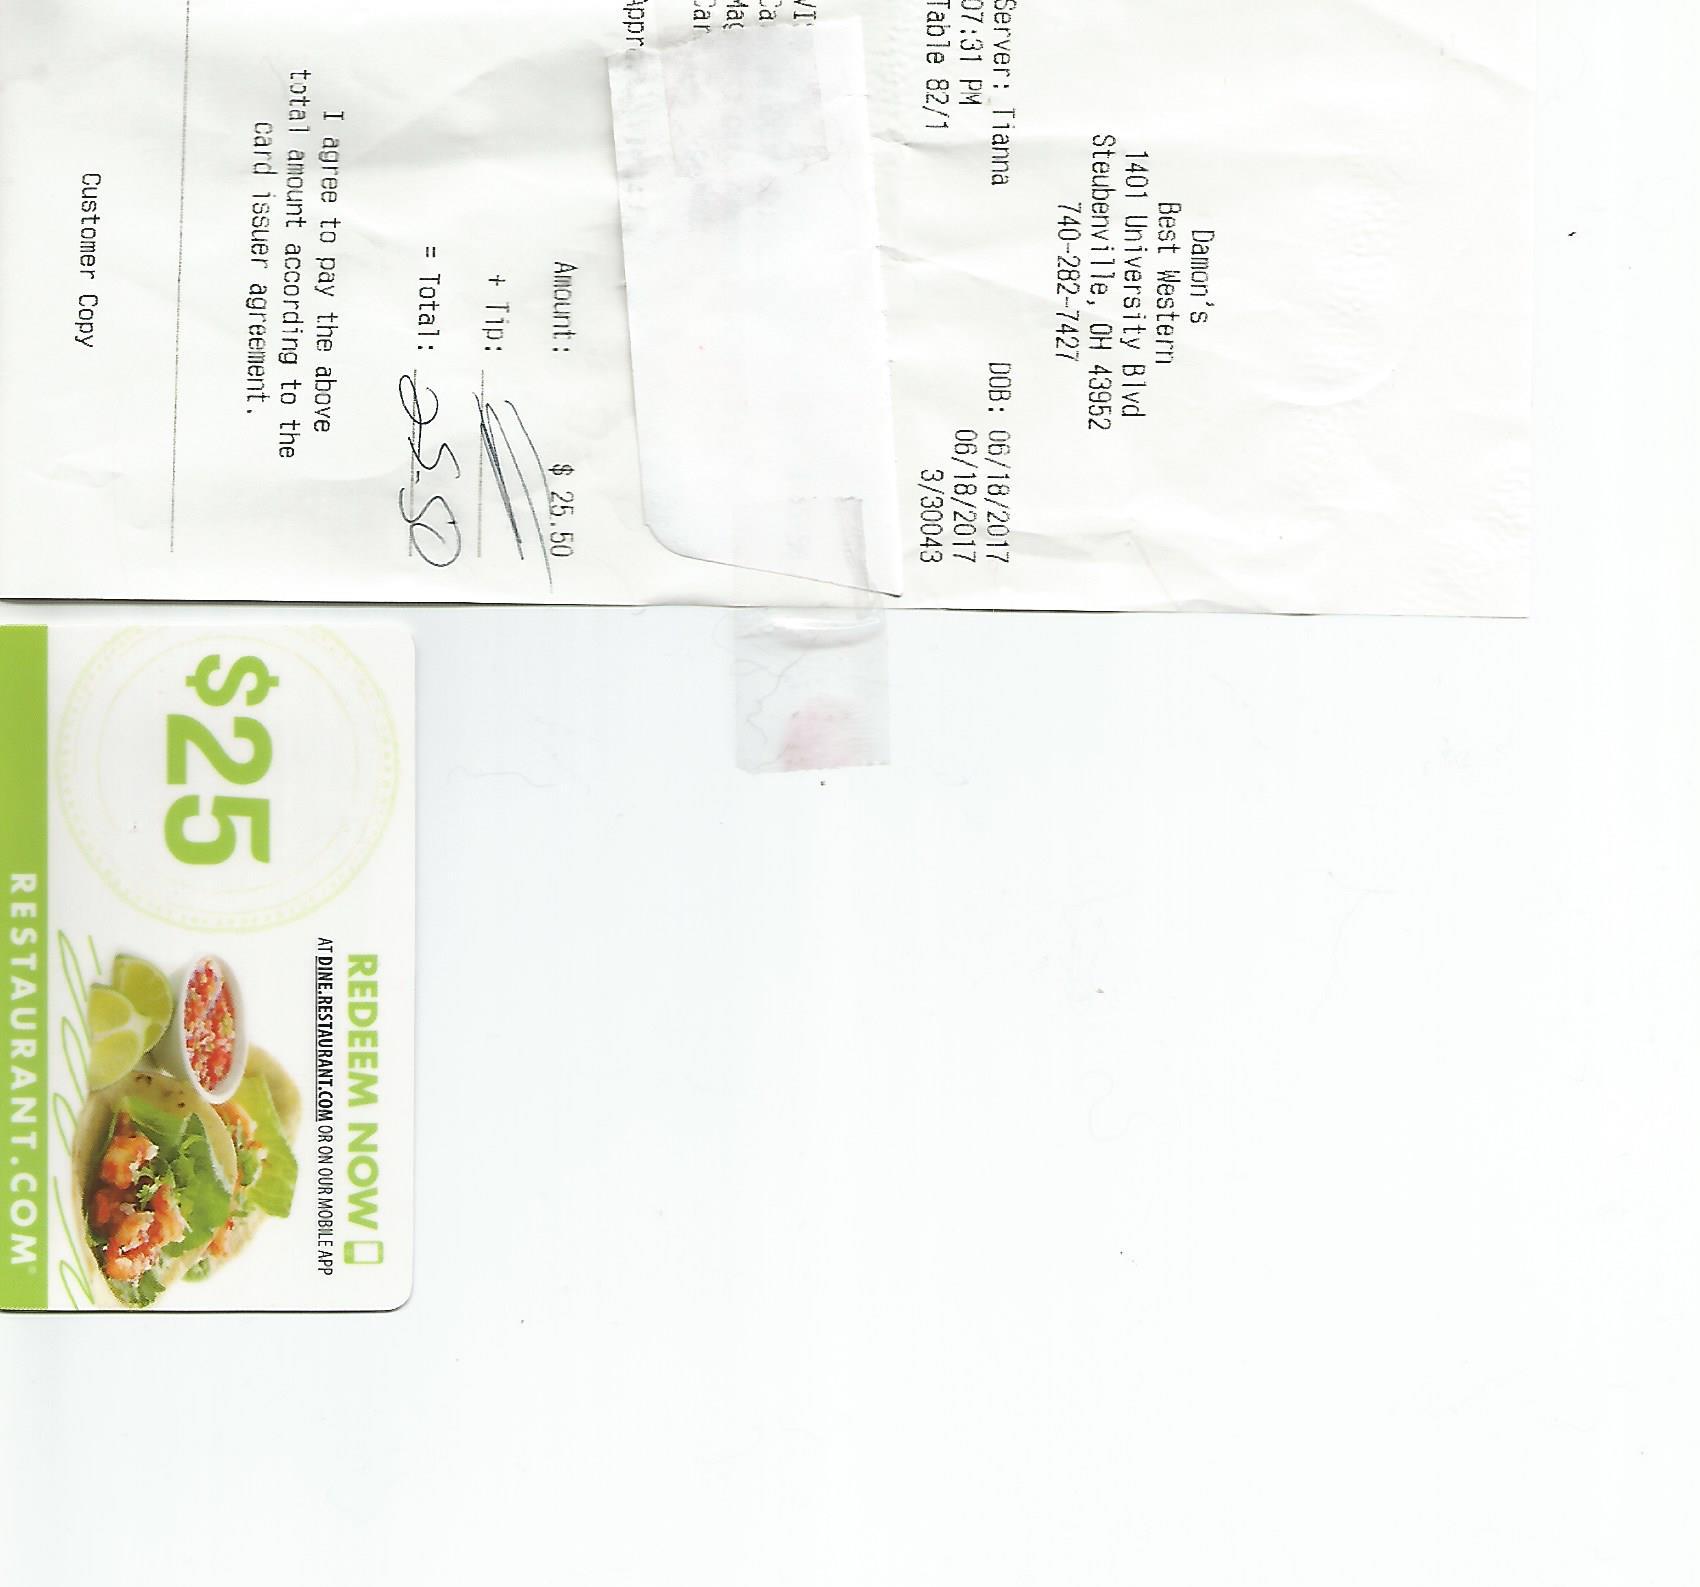 Restaurant Reviews 657 Reviews Of Restaurant Sitejabber